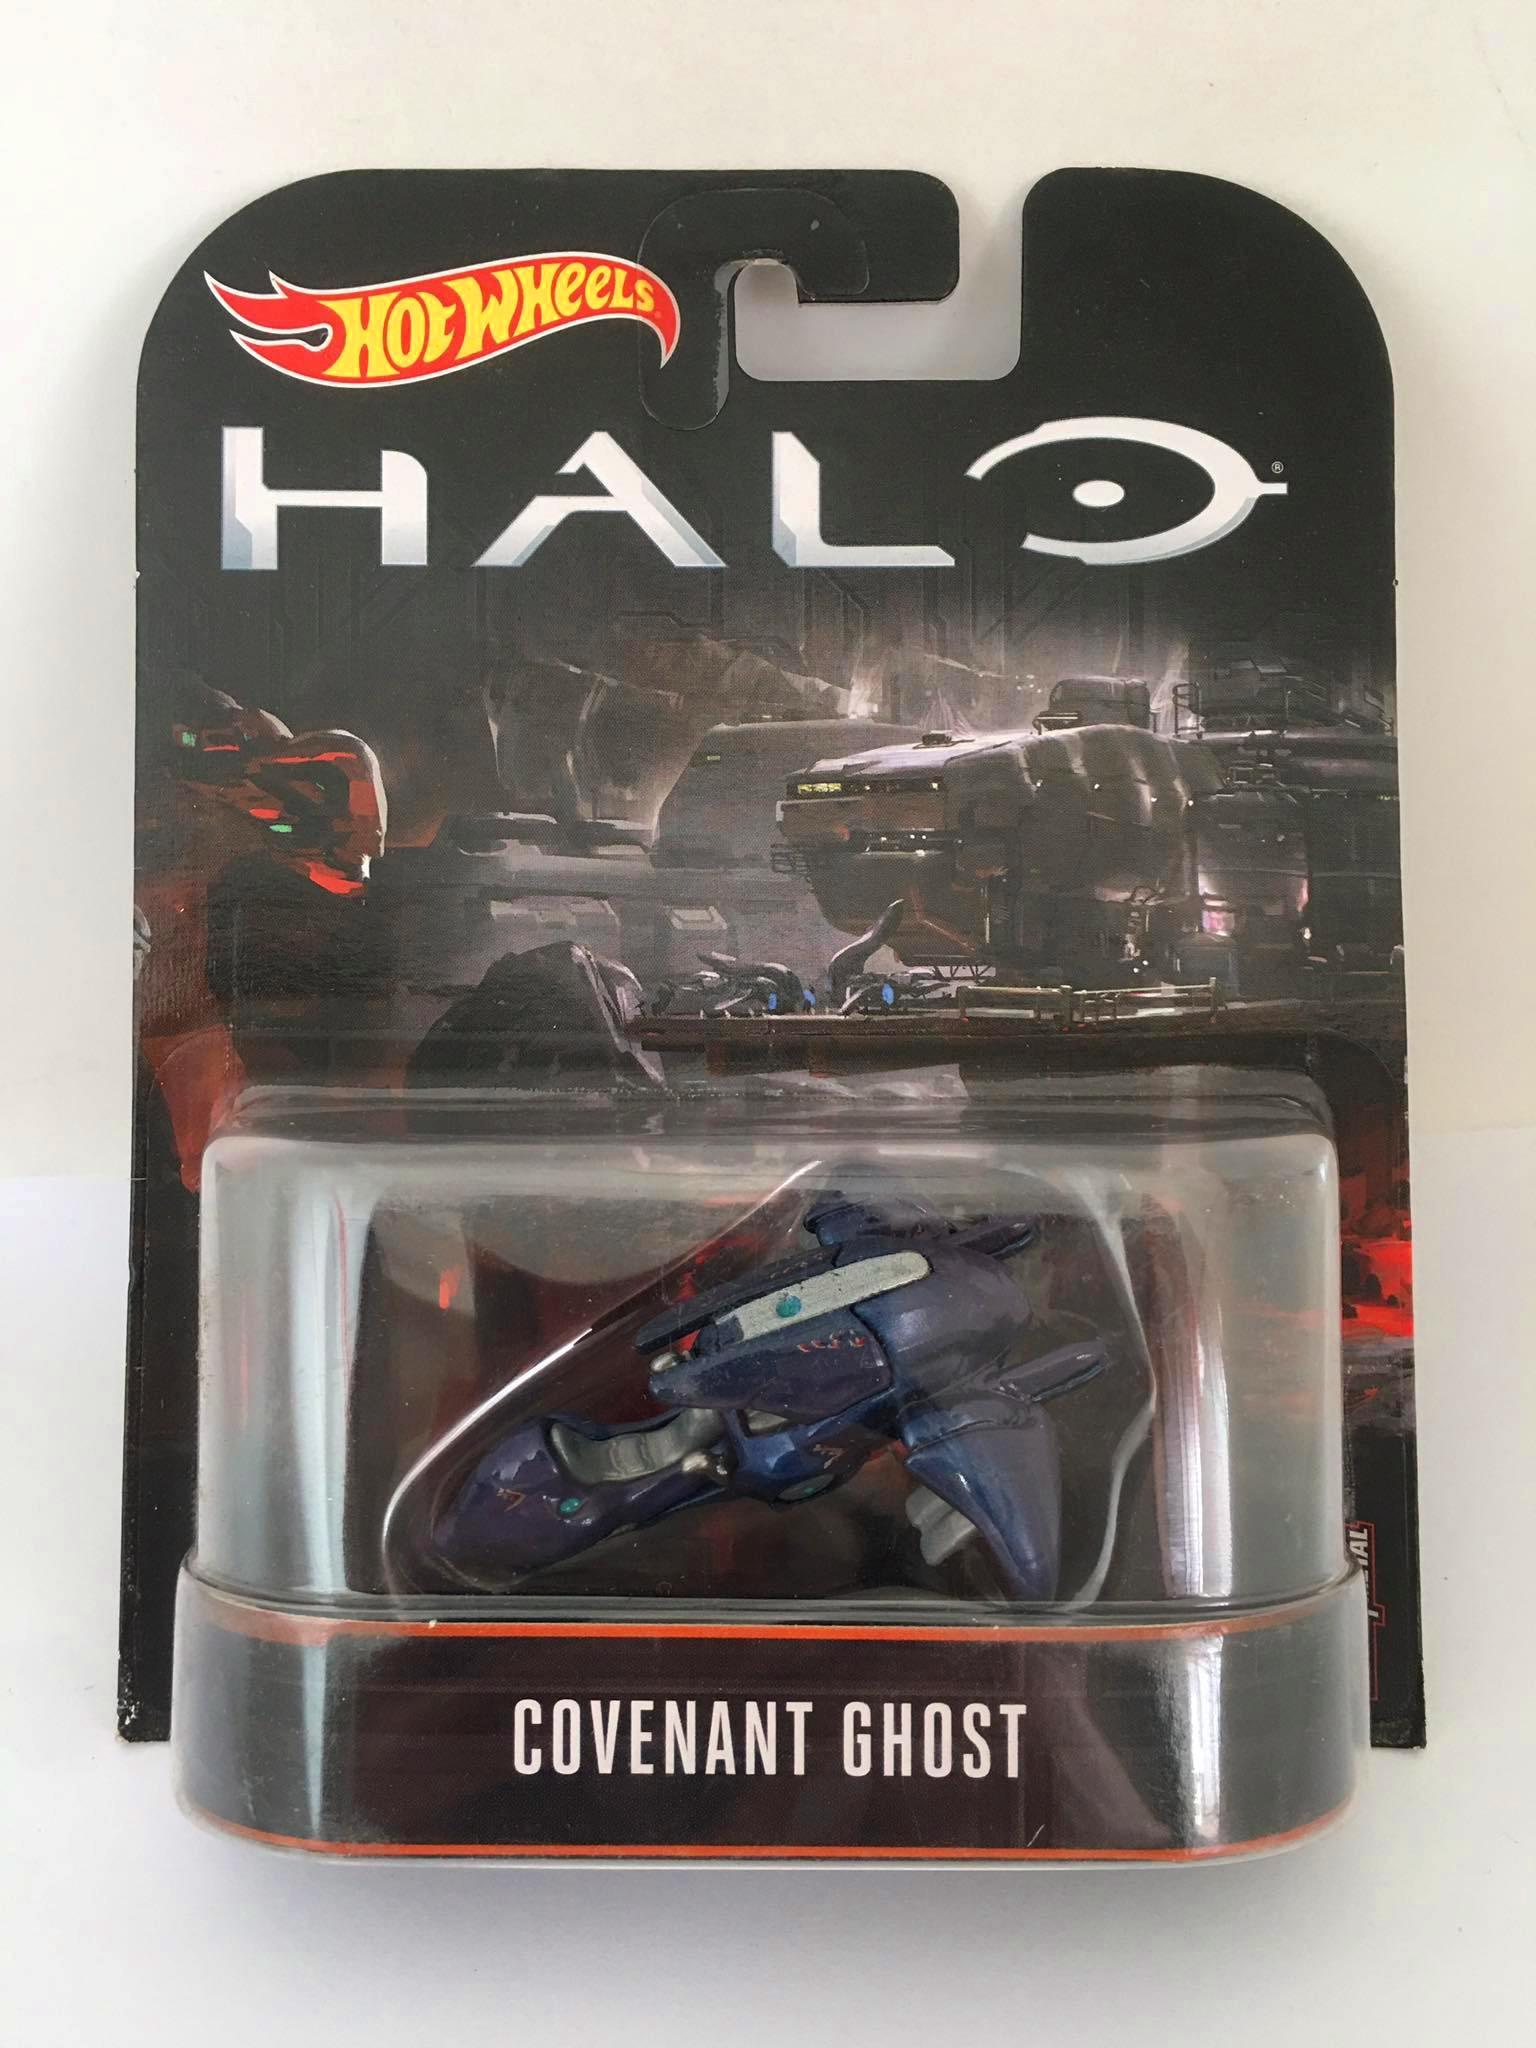 Hot Wheels - Covenant Ghost - HALO - Retro